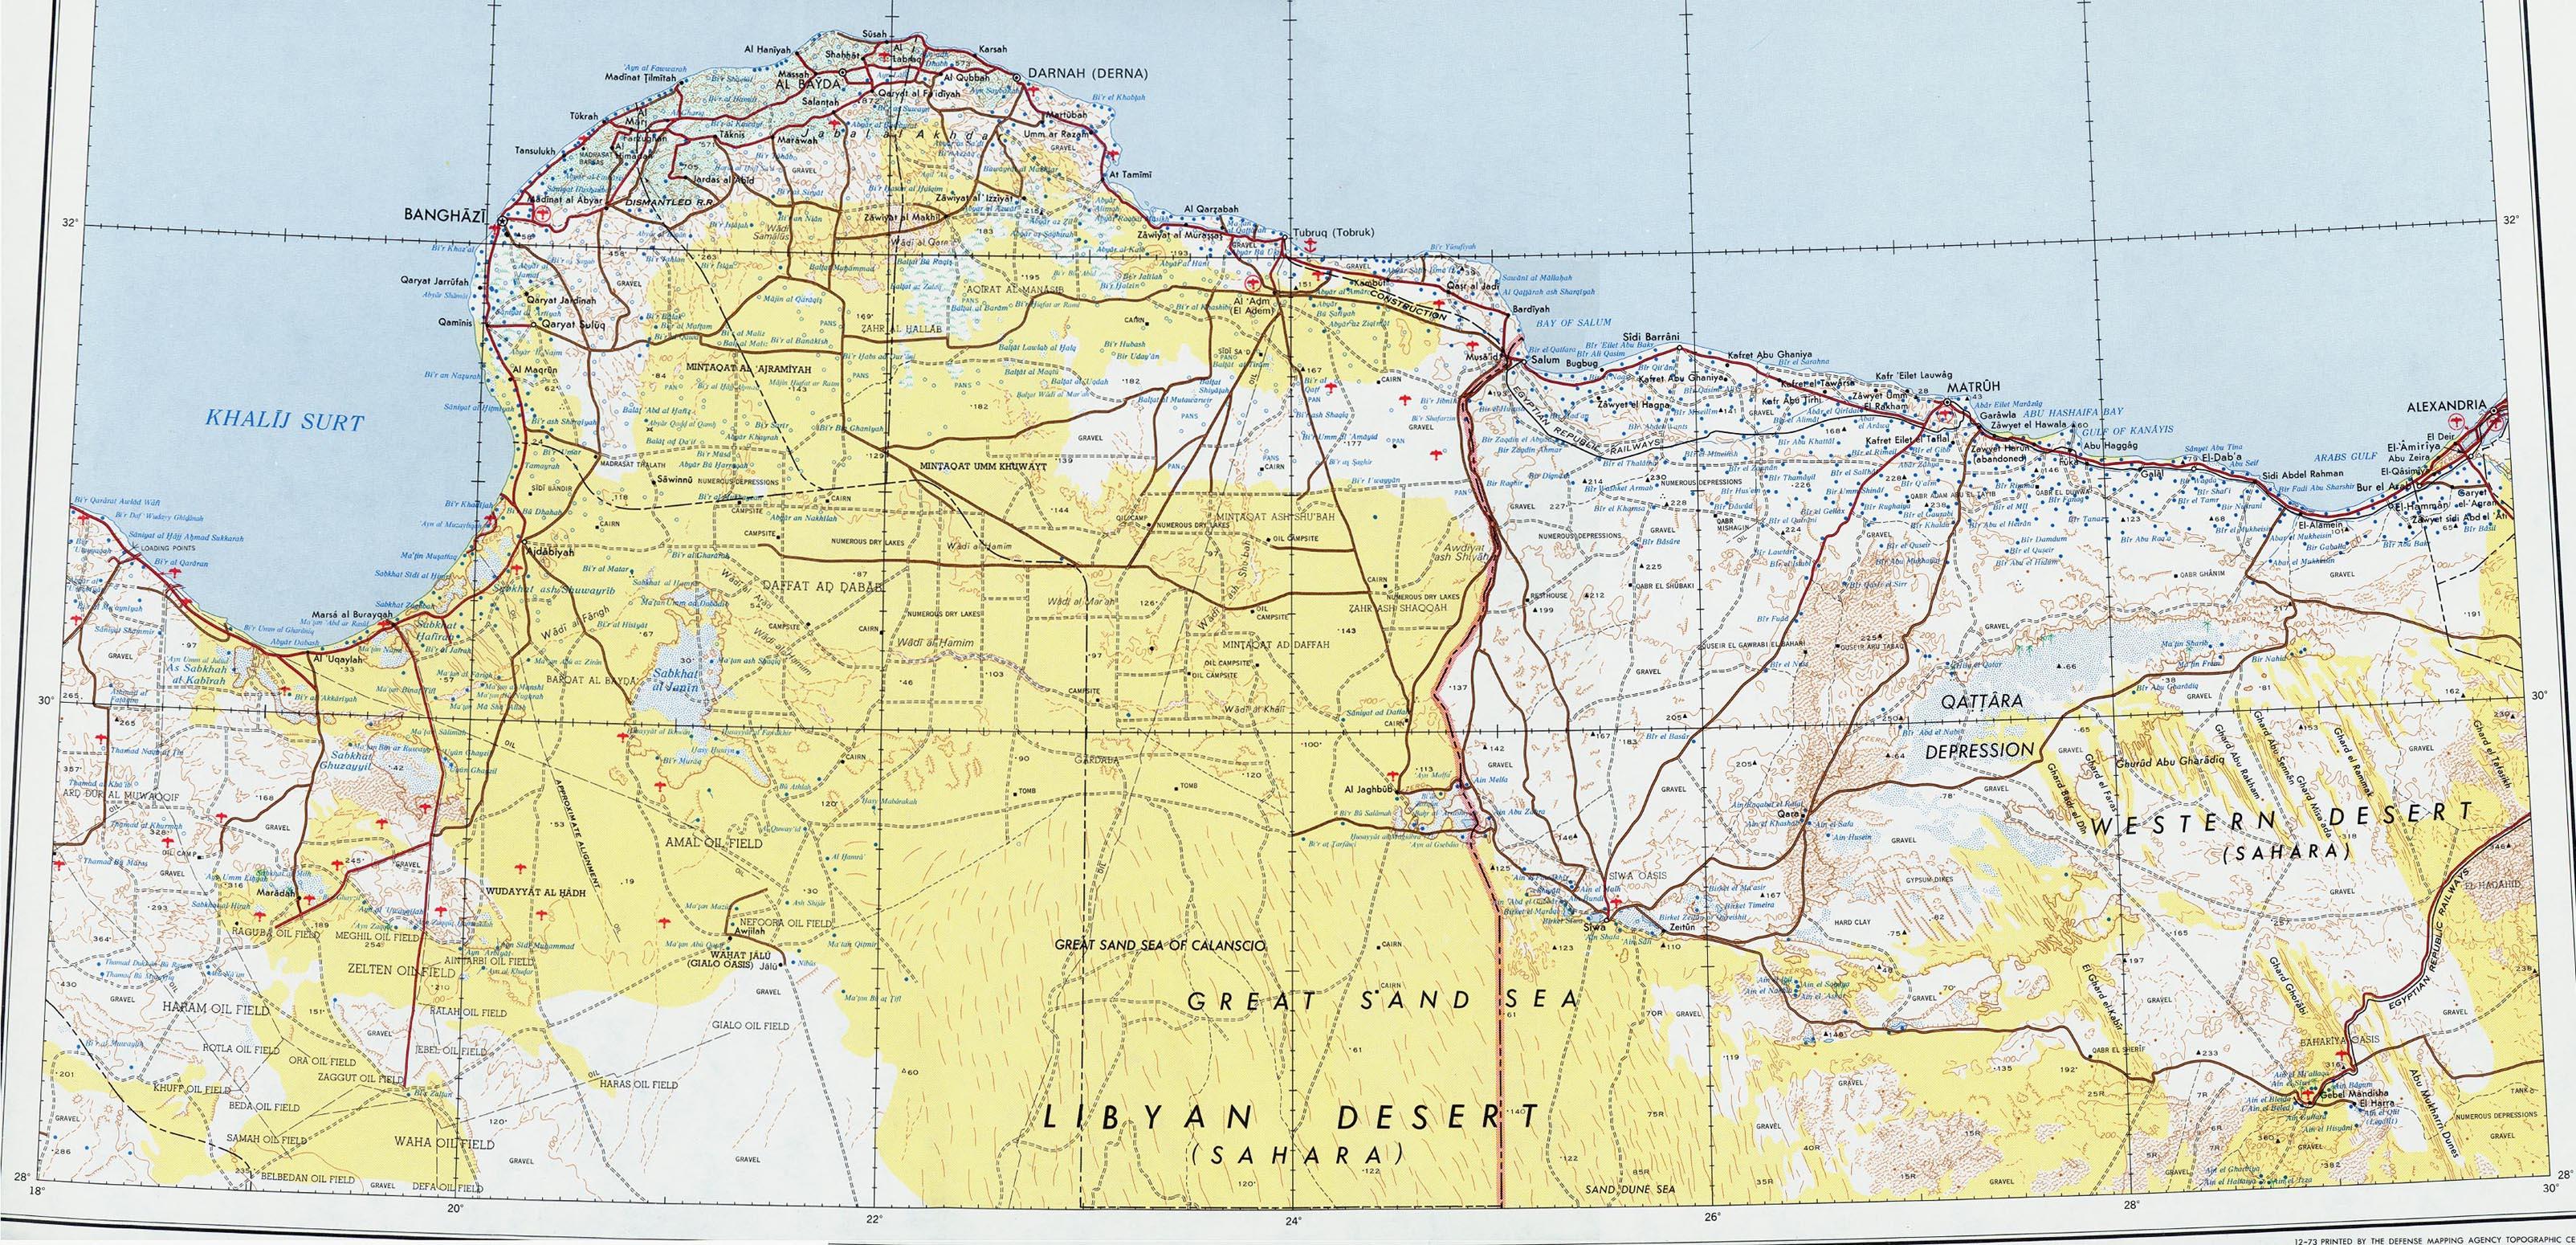 FileBanghazi Area Map US Army Jpg Wikimedia Commons - Us army travel map